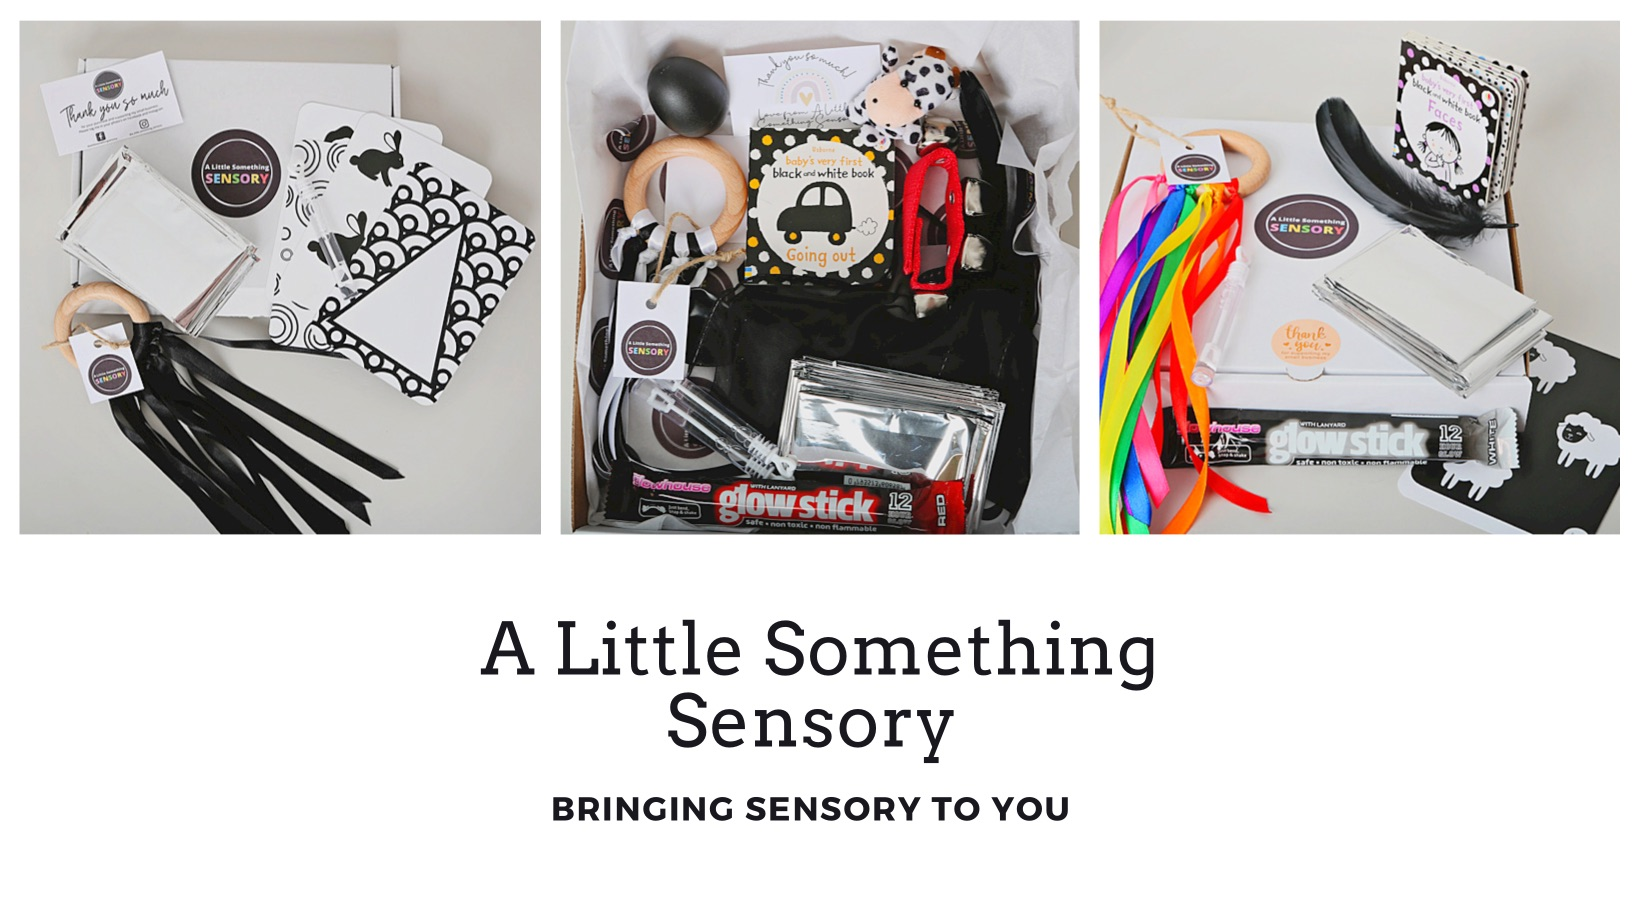 A Little Something Sensory's main image